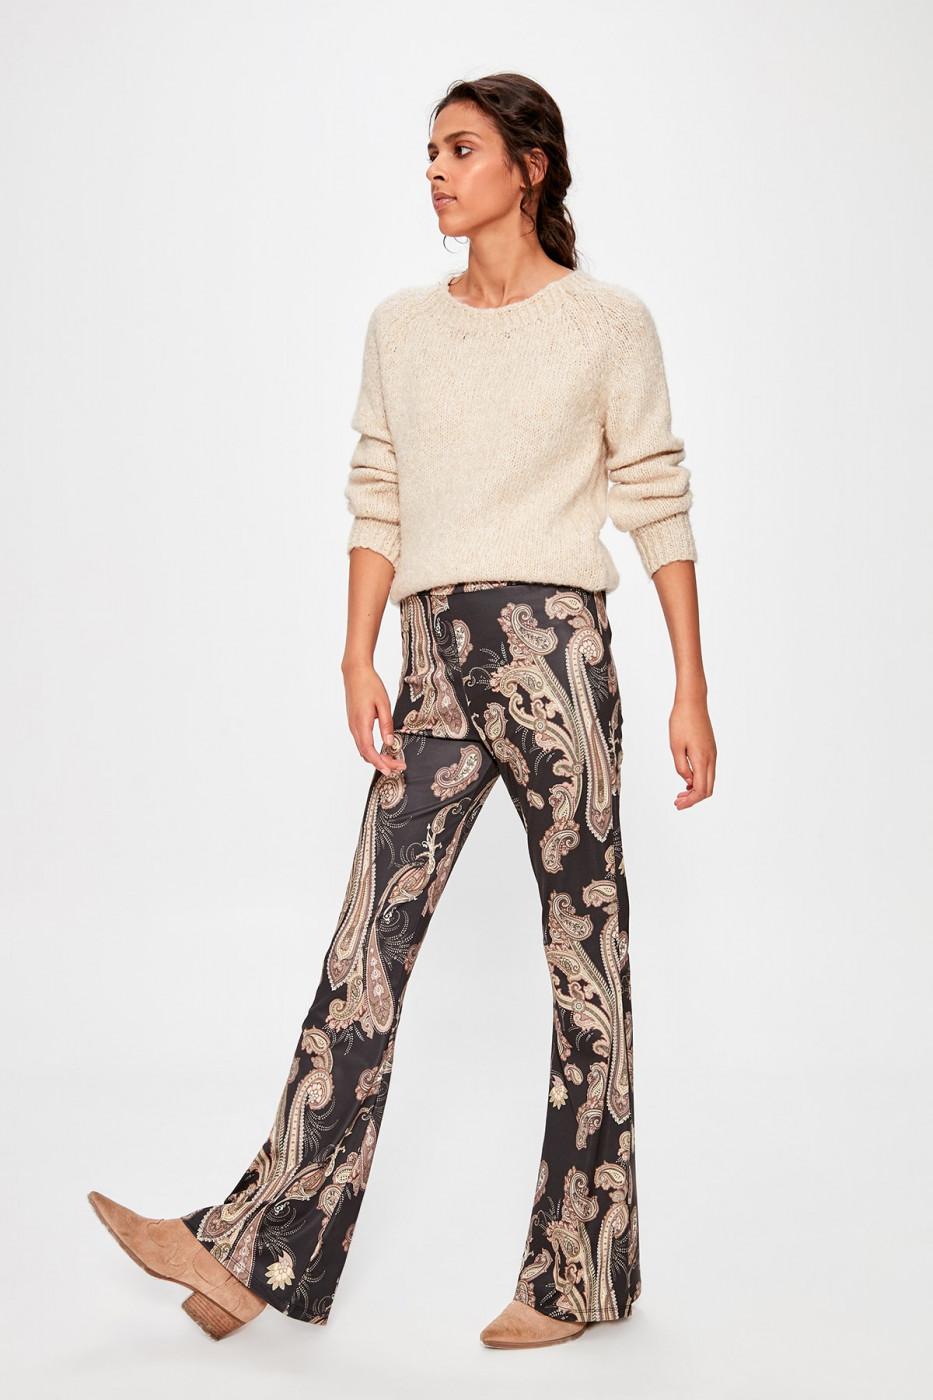 Trendyol Black Patterned Knitted Pants